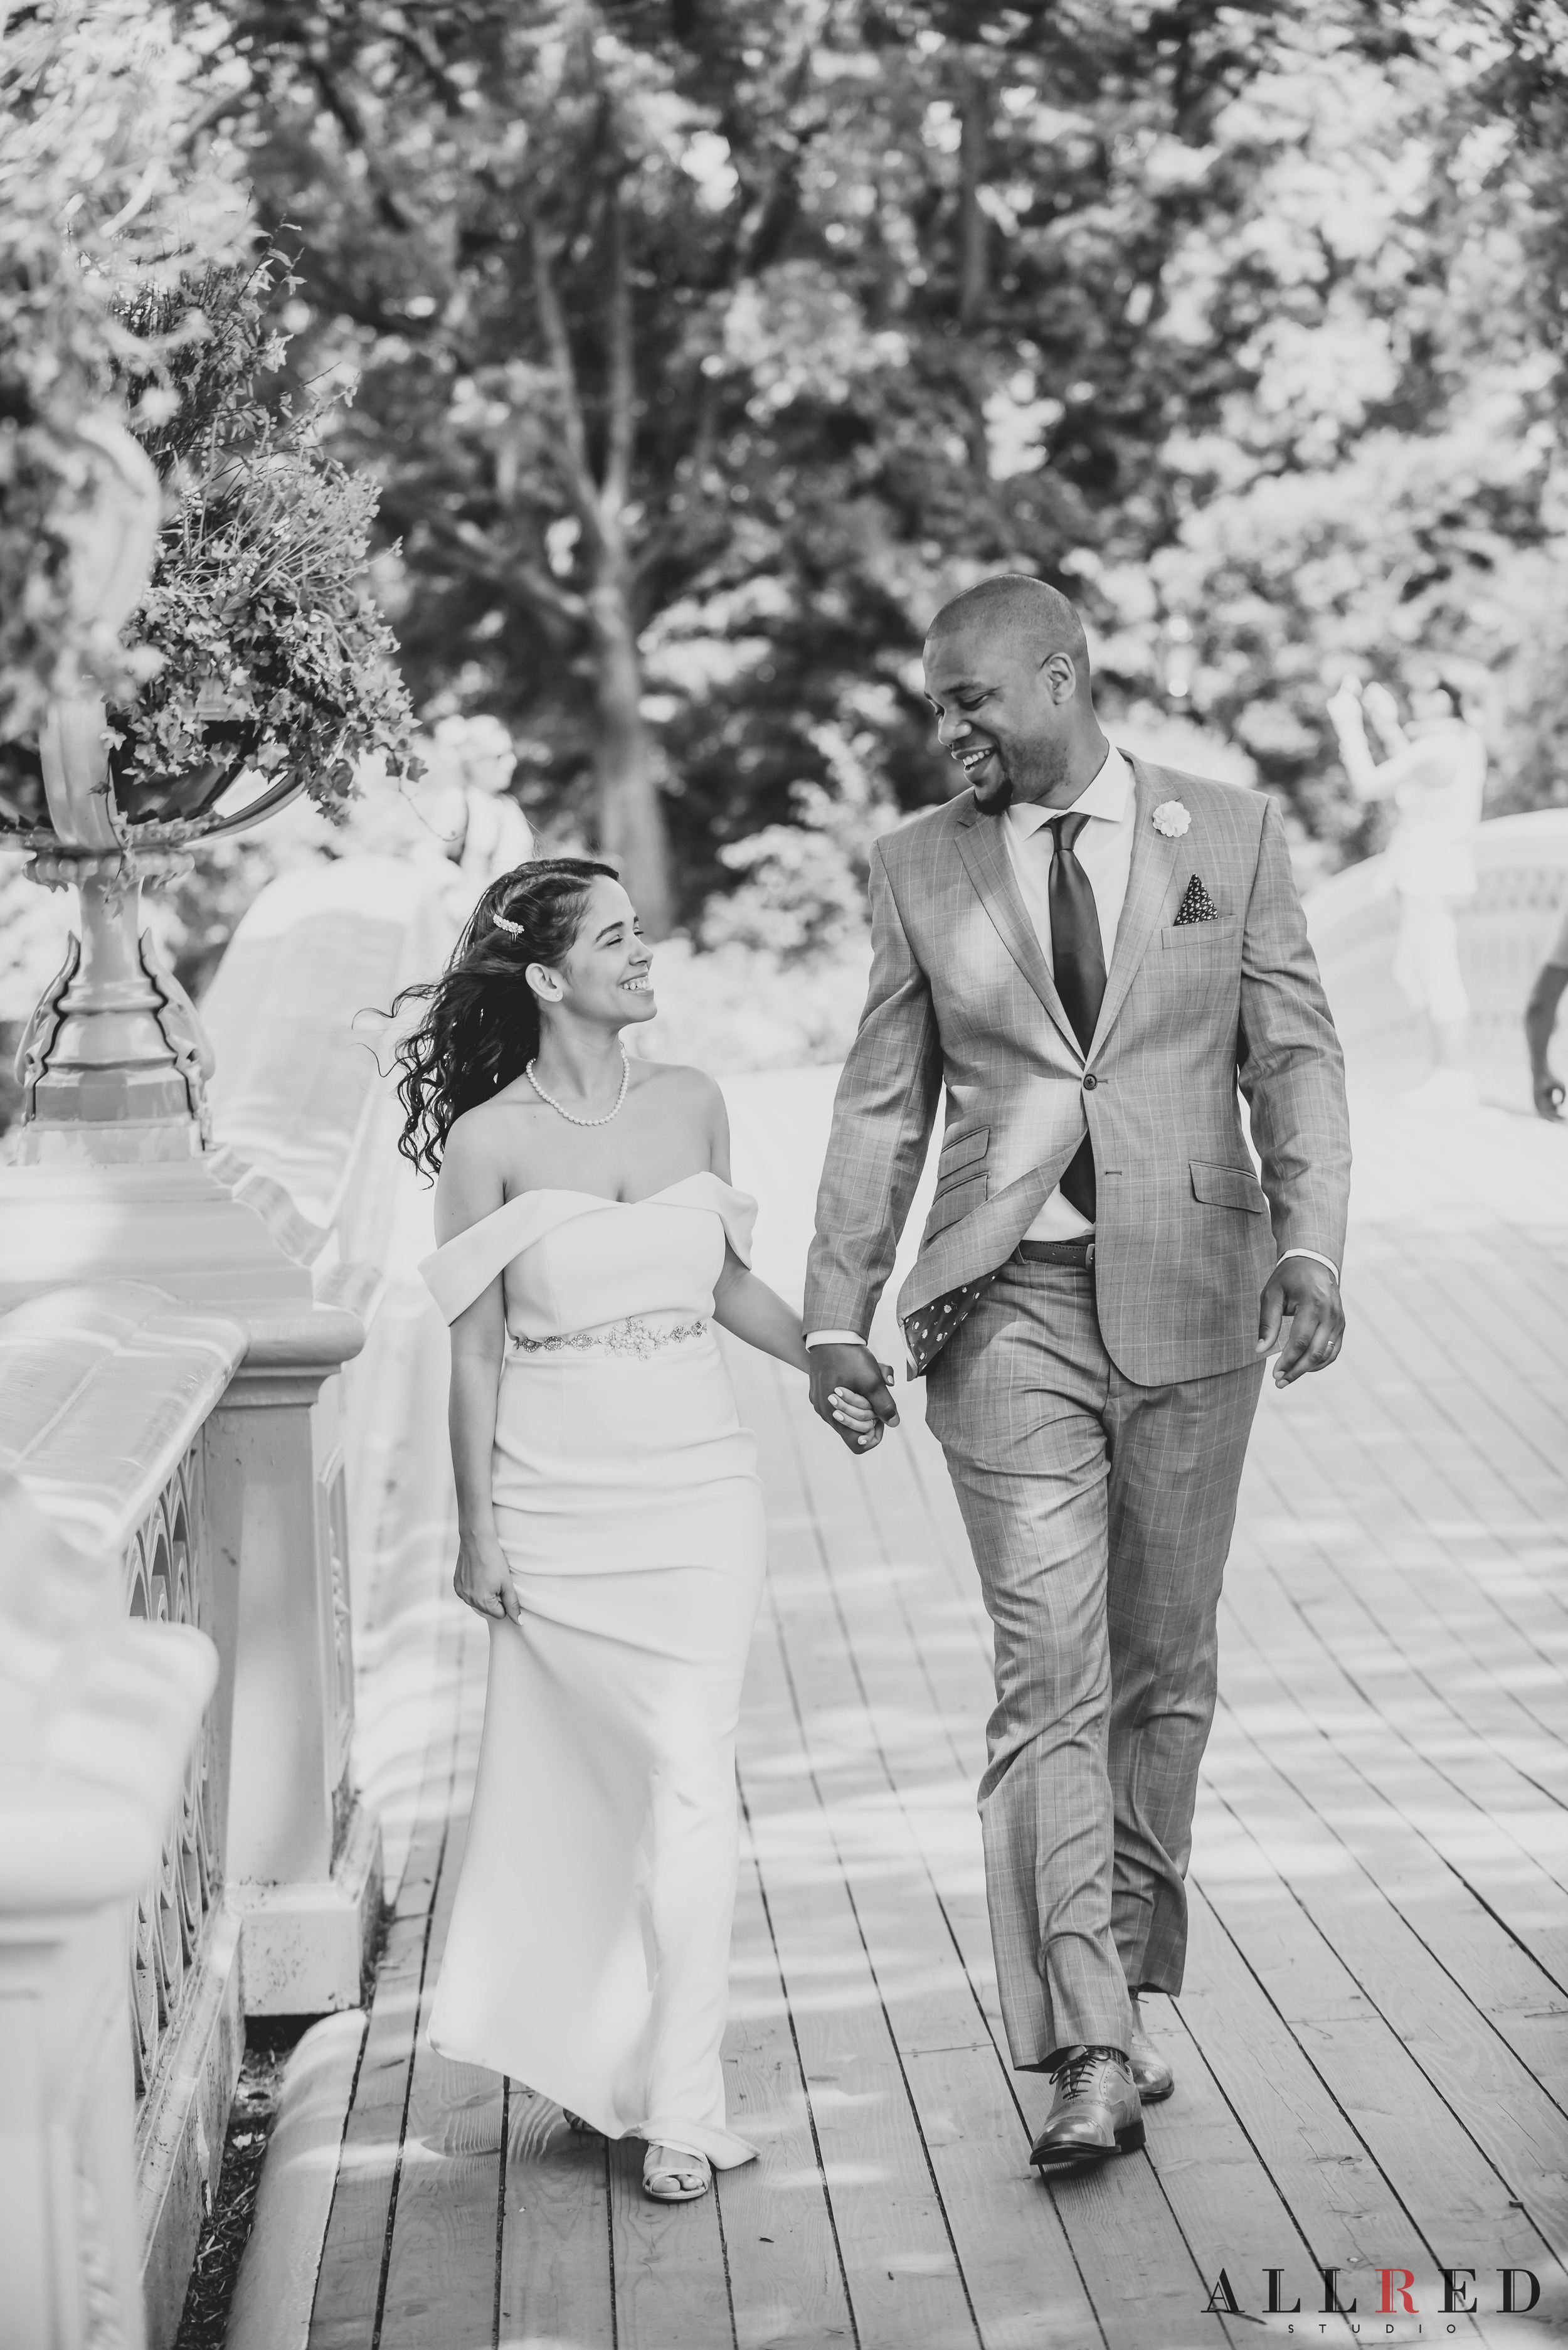 Wedding-central-park-allred-studio-new-york-photographer-new-jersey-hudson-valley-2463.jpg